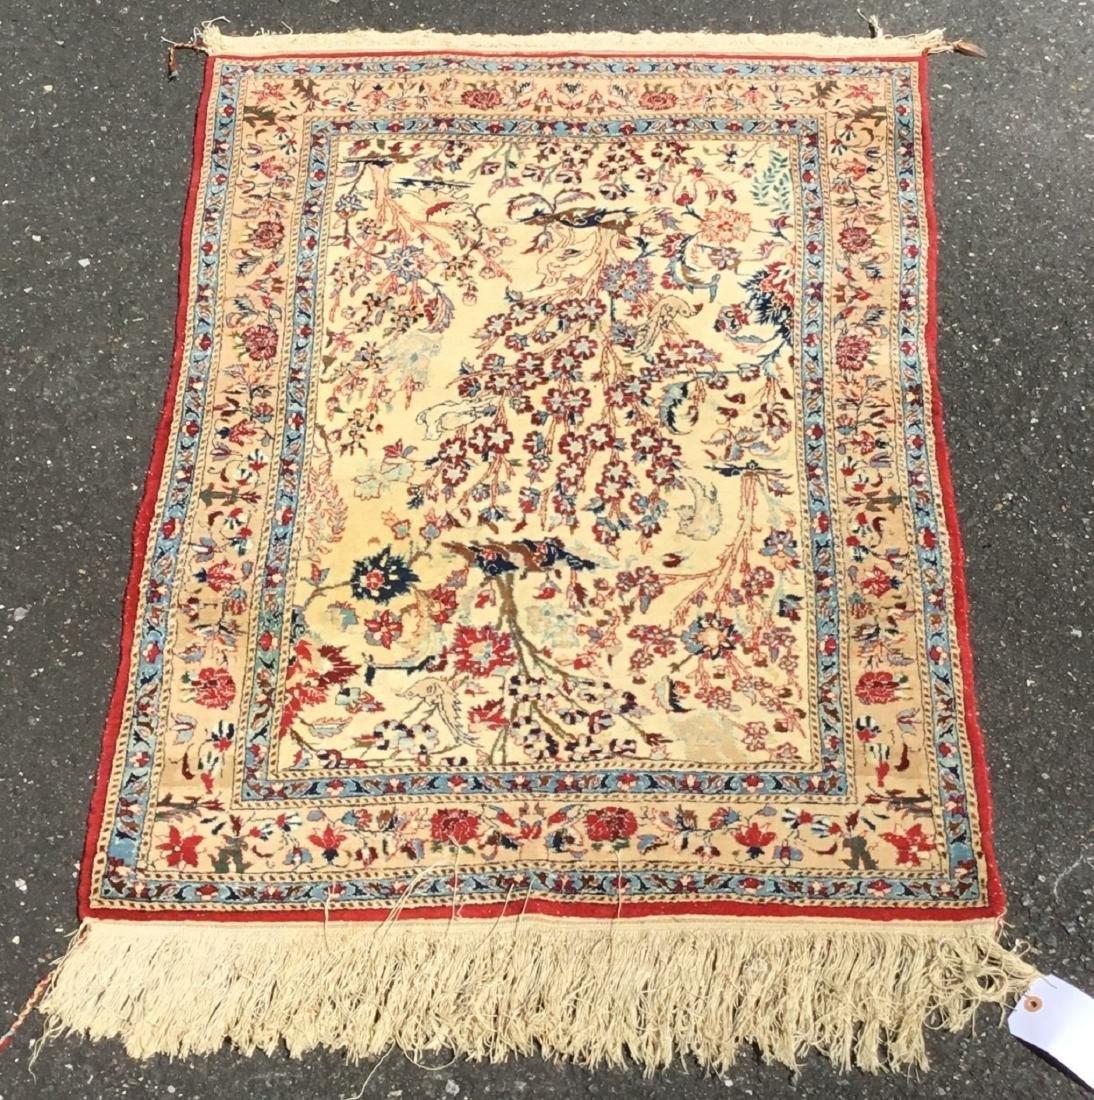 Semi-Antique Persian Isfahan area rug, circa mid-20th